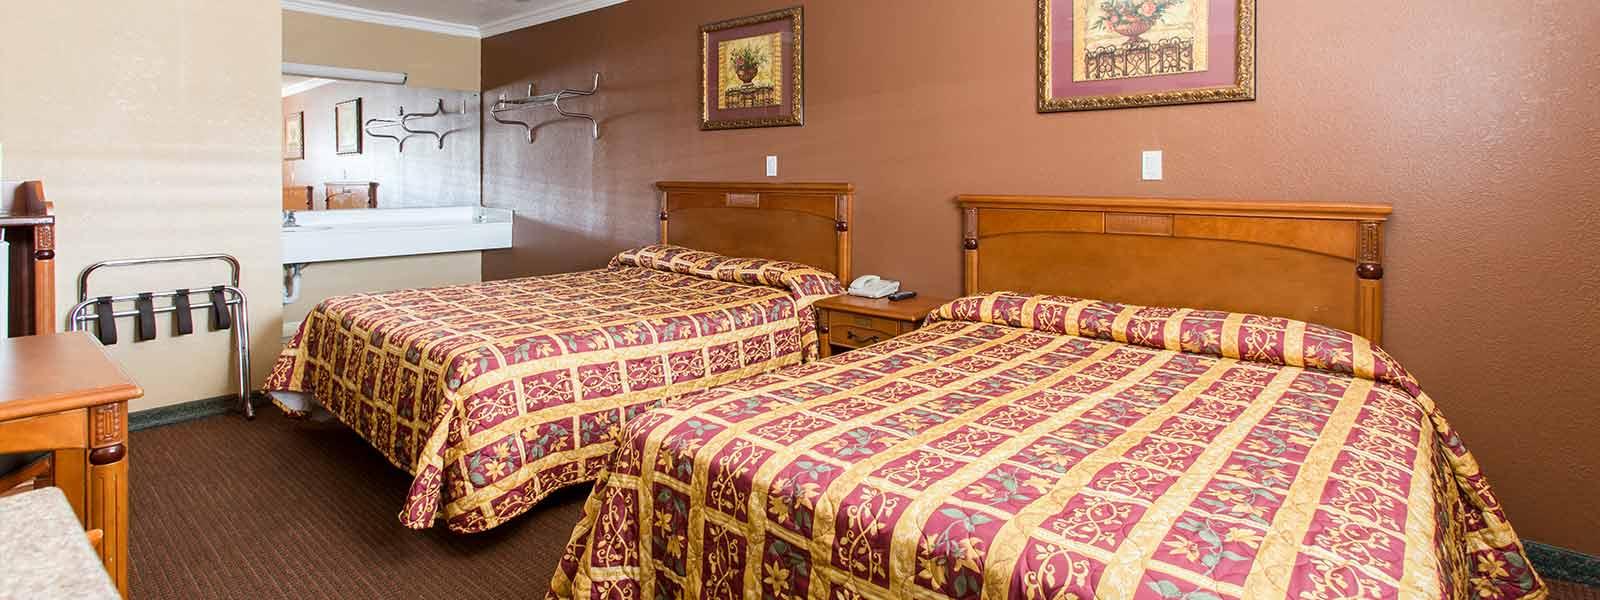 Best Budget Motel in Los Angeles | Best Motel in United